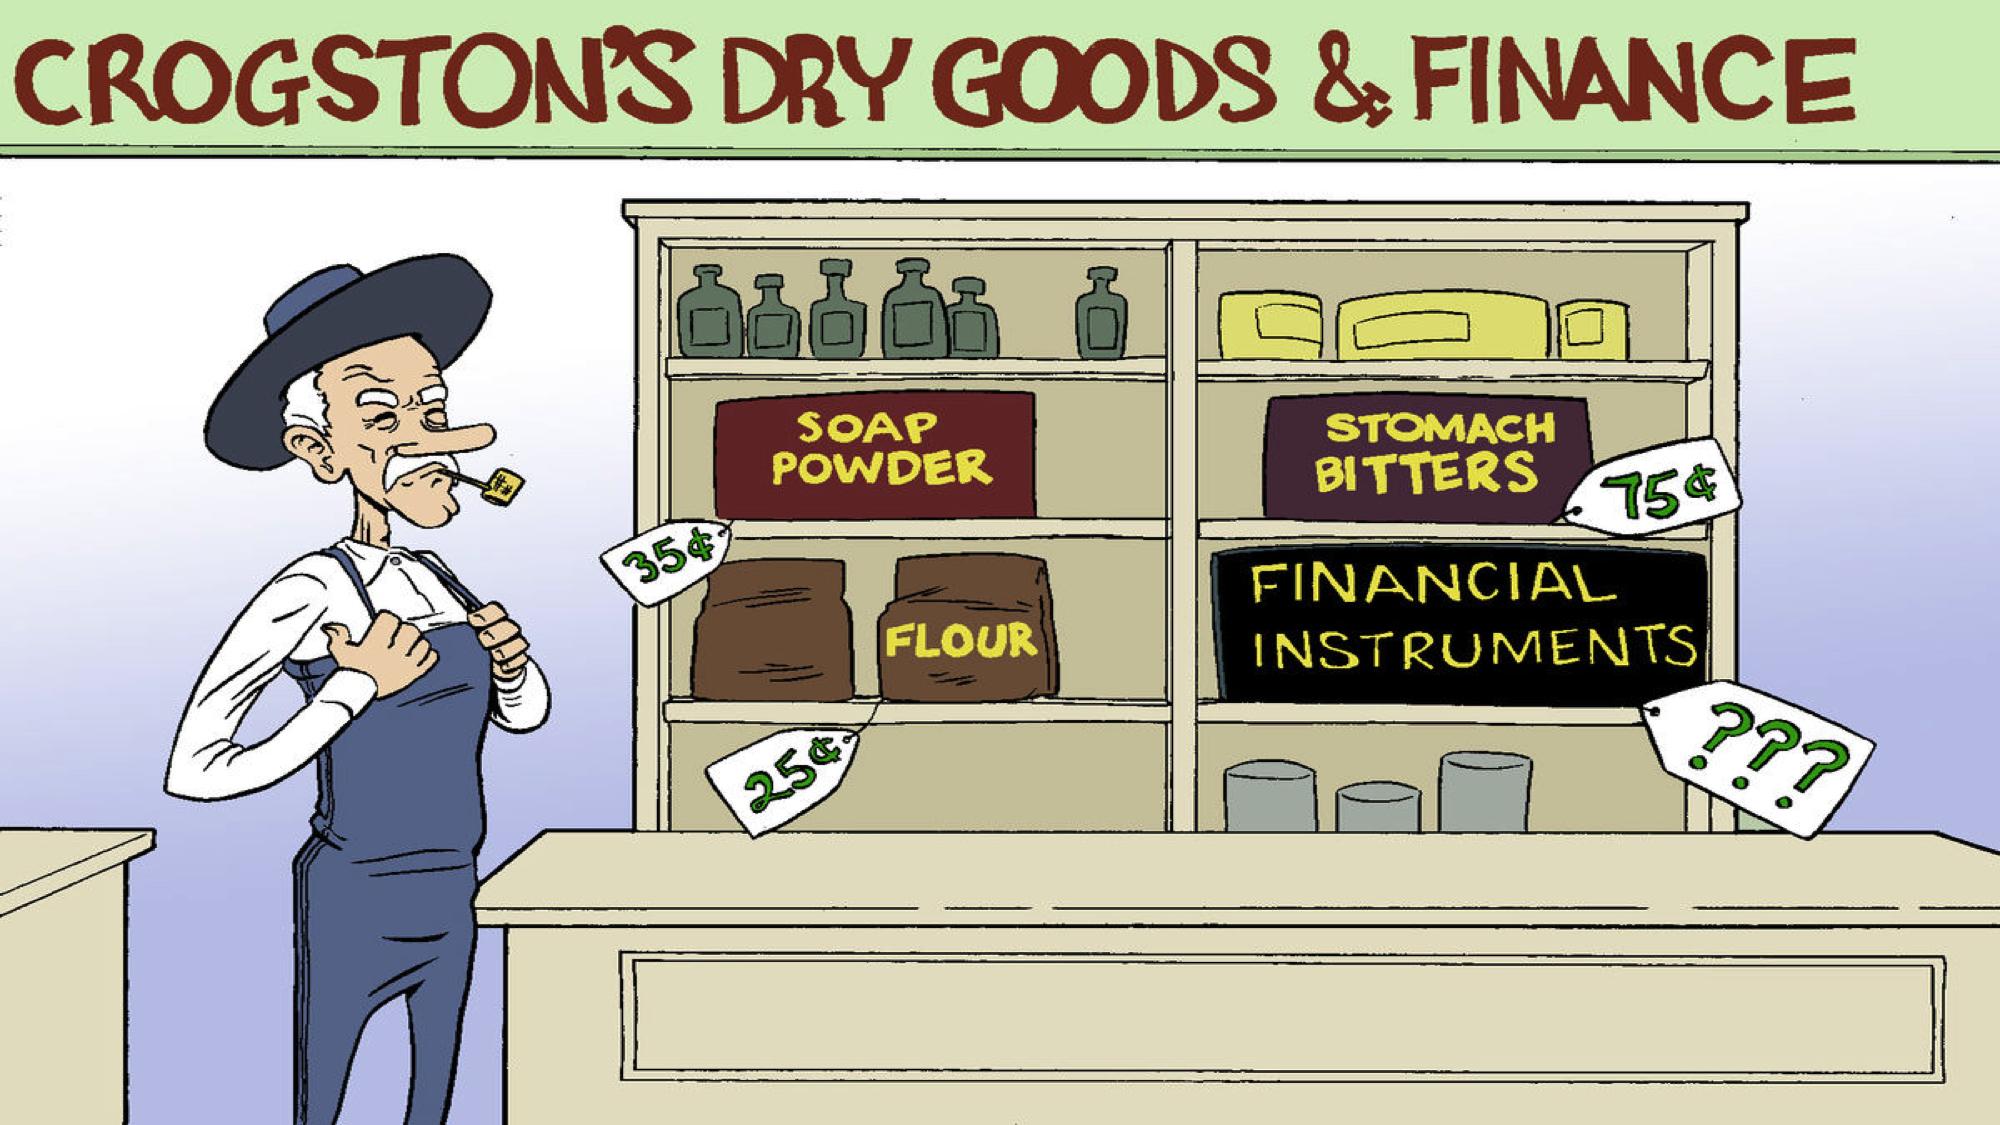 crogstone-dry-goods-and-finance